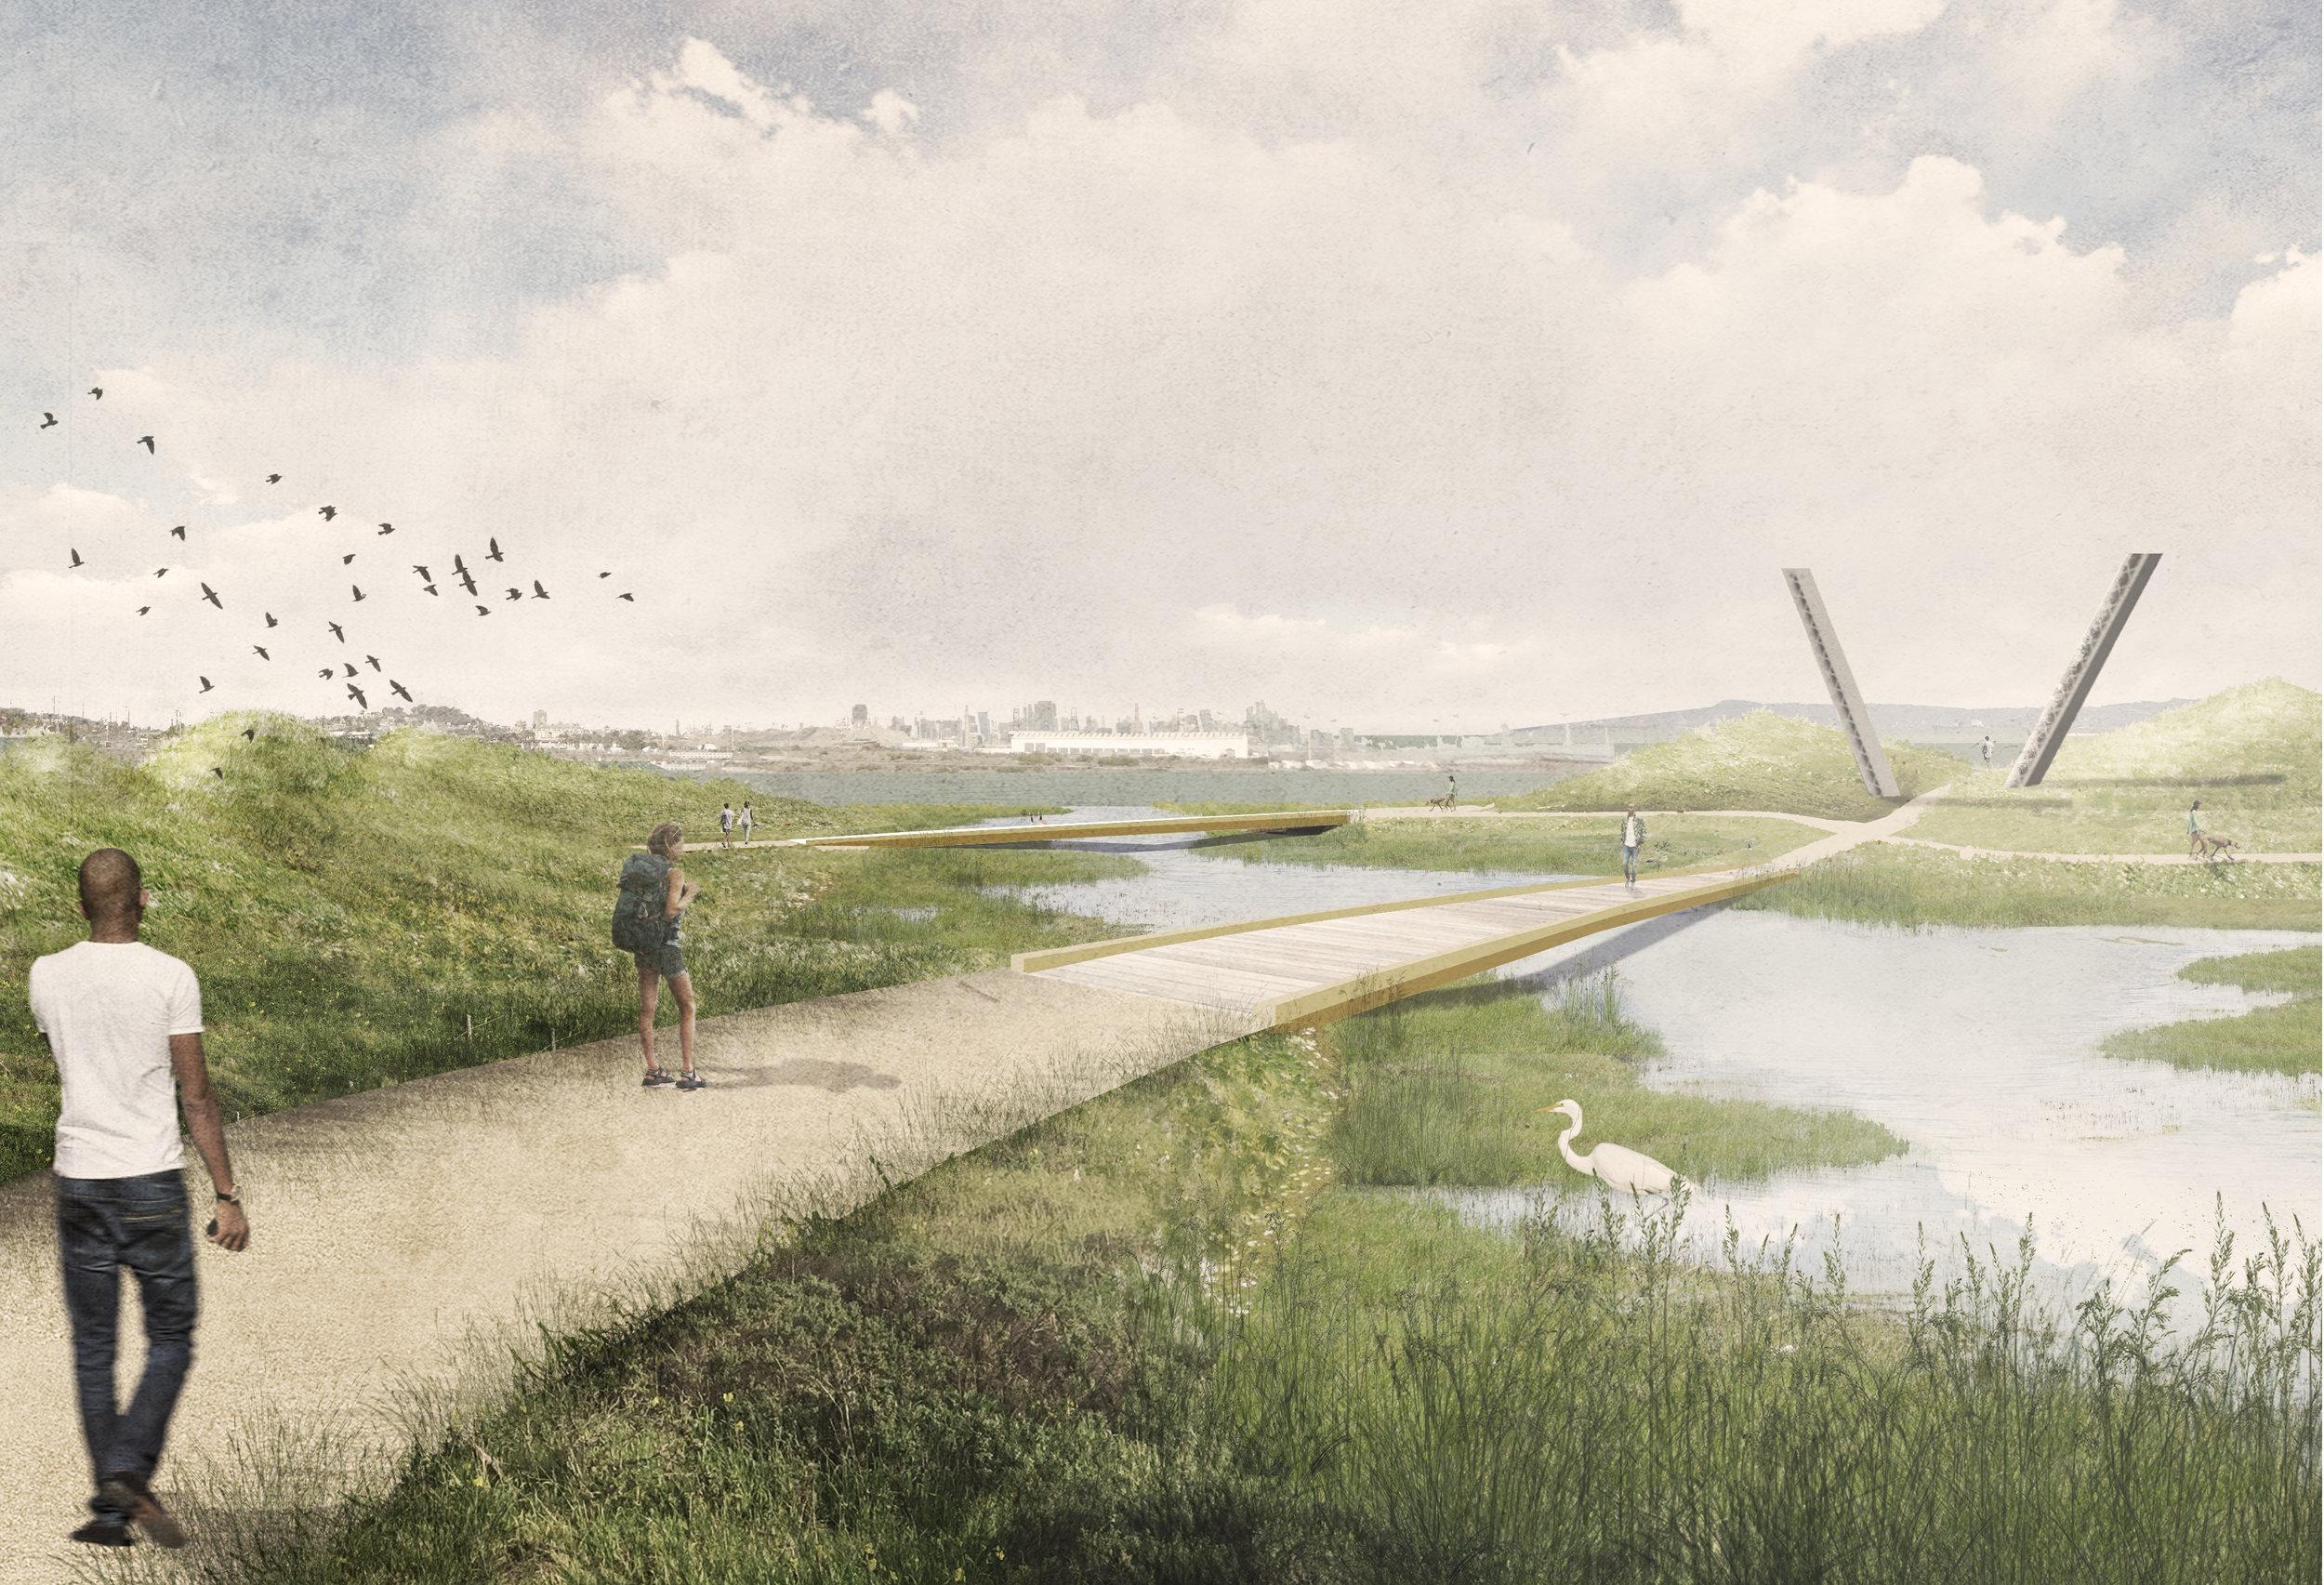 View 2 - stormwater pond.jpg